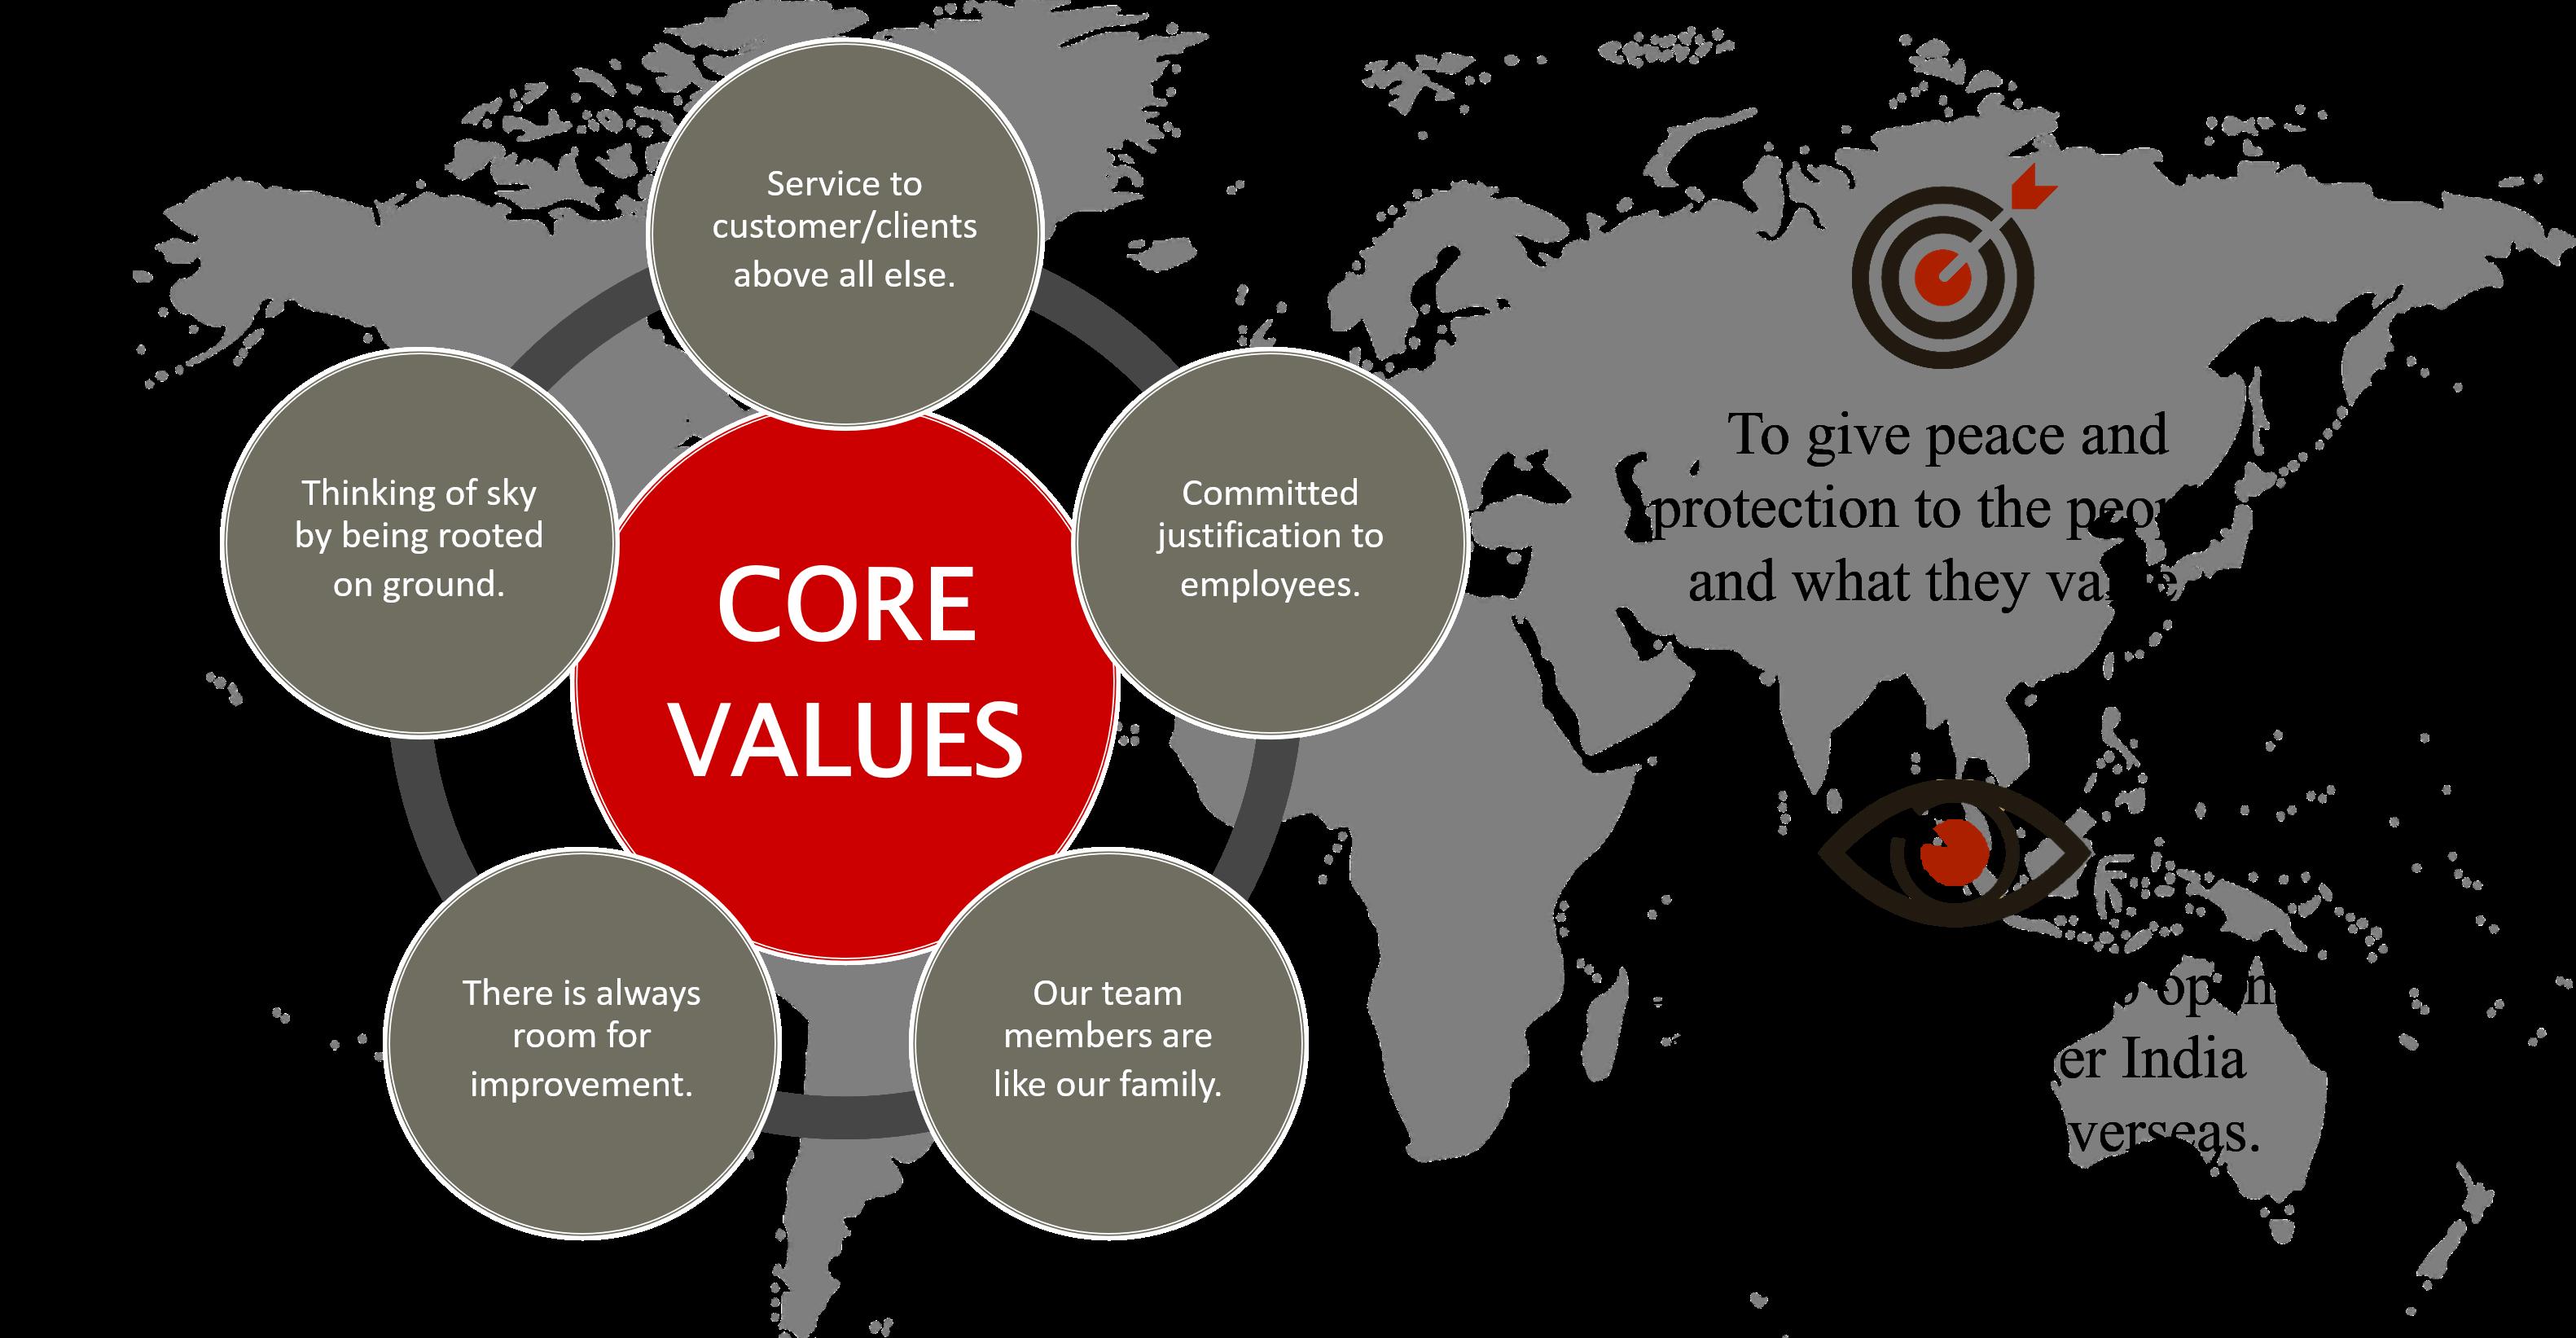 core-values-desktop-perfect-protection-security-cleaning-dubai